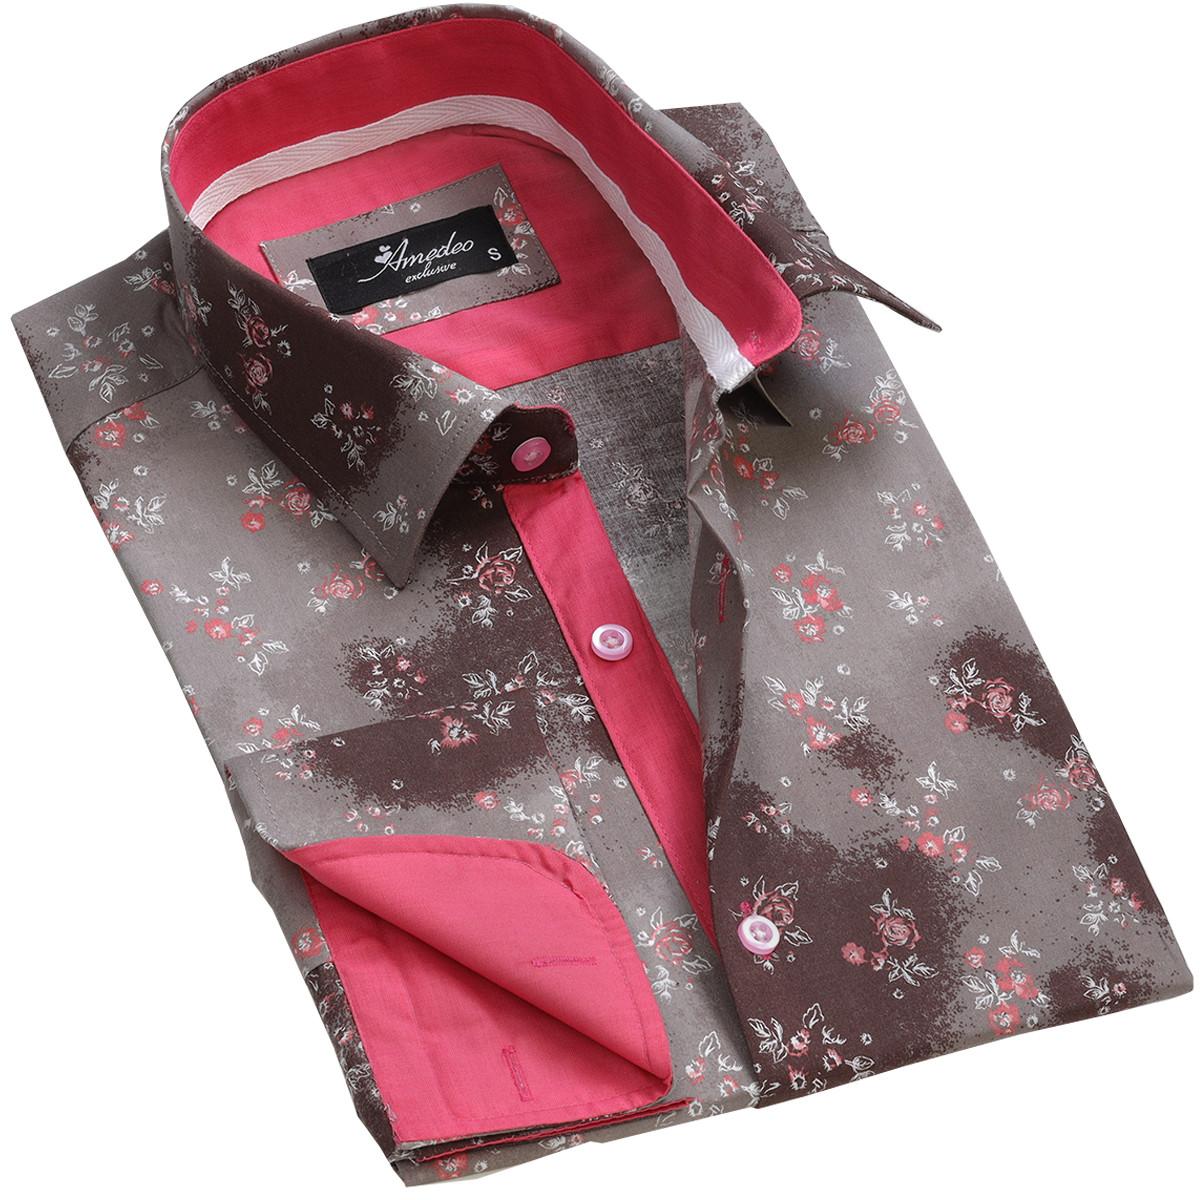 European Made & Designed Reversible Cuff Premium French Cuff Dress Shirt - brown floral